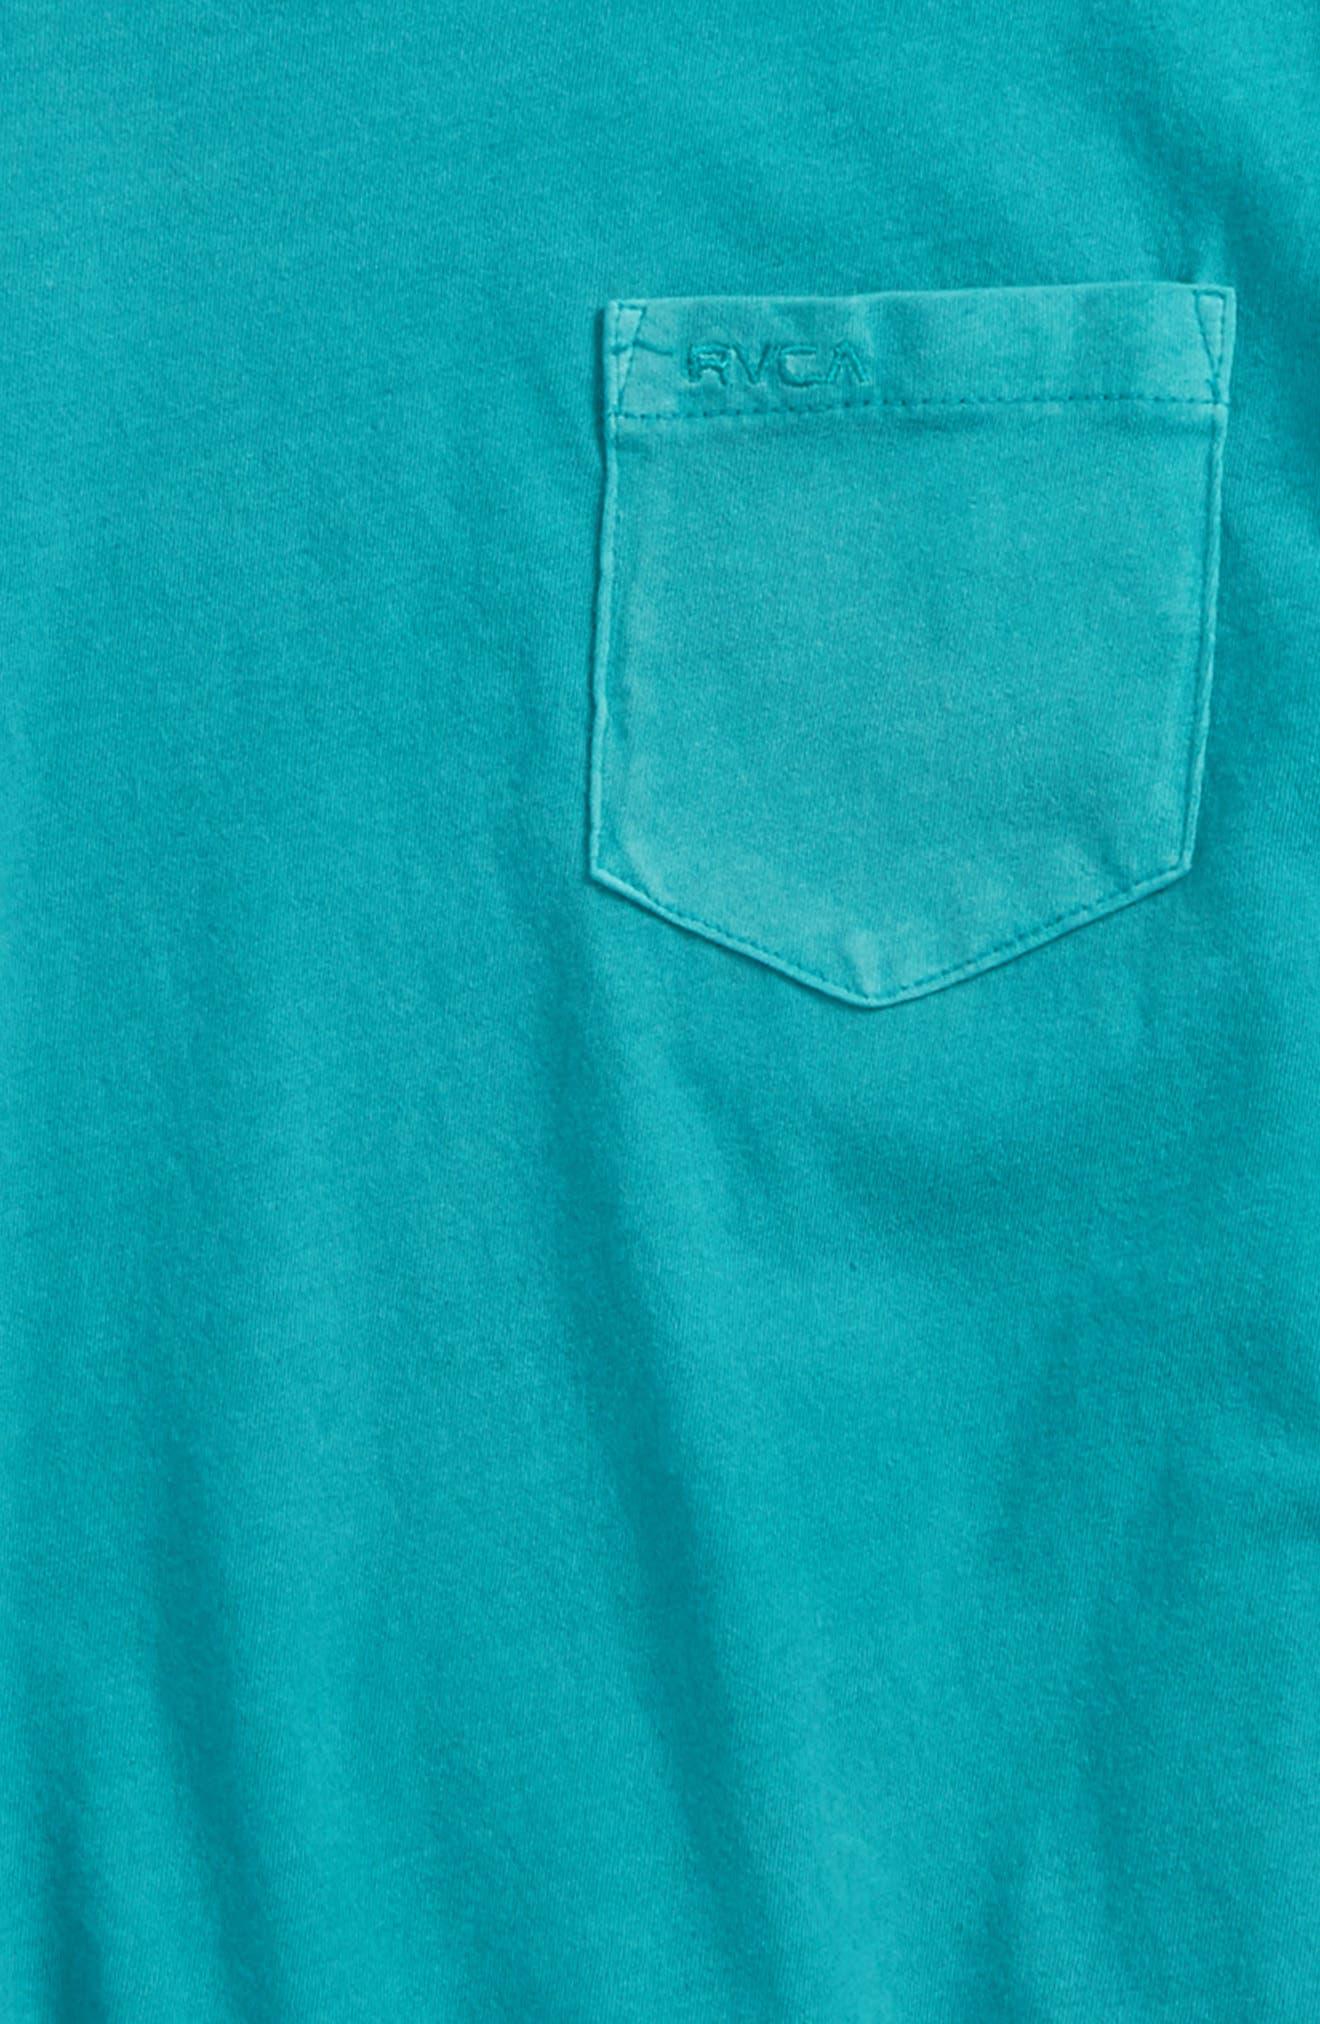 Pigment T-Shirt,                             Alternate thumbnail 2, color,                             440